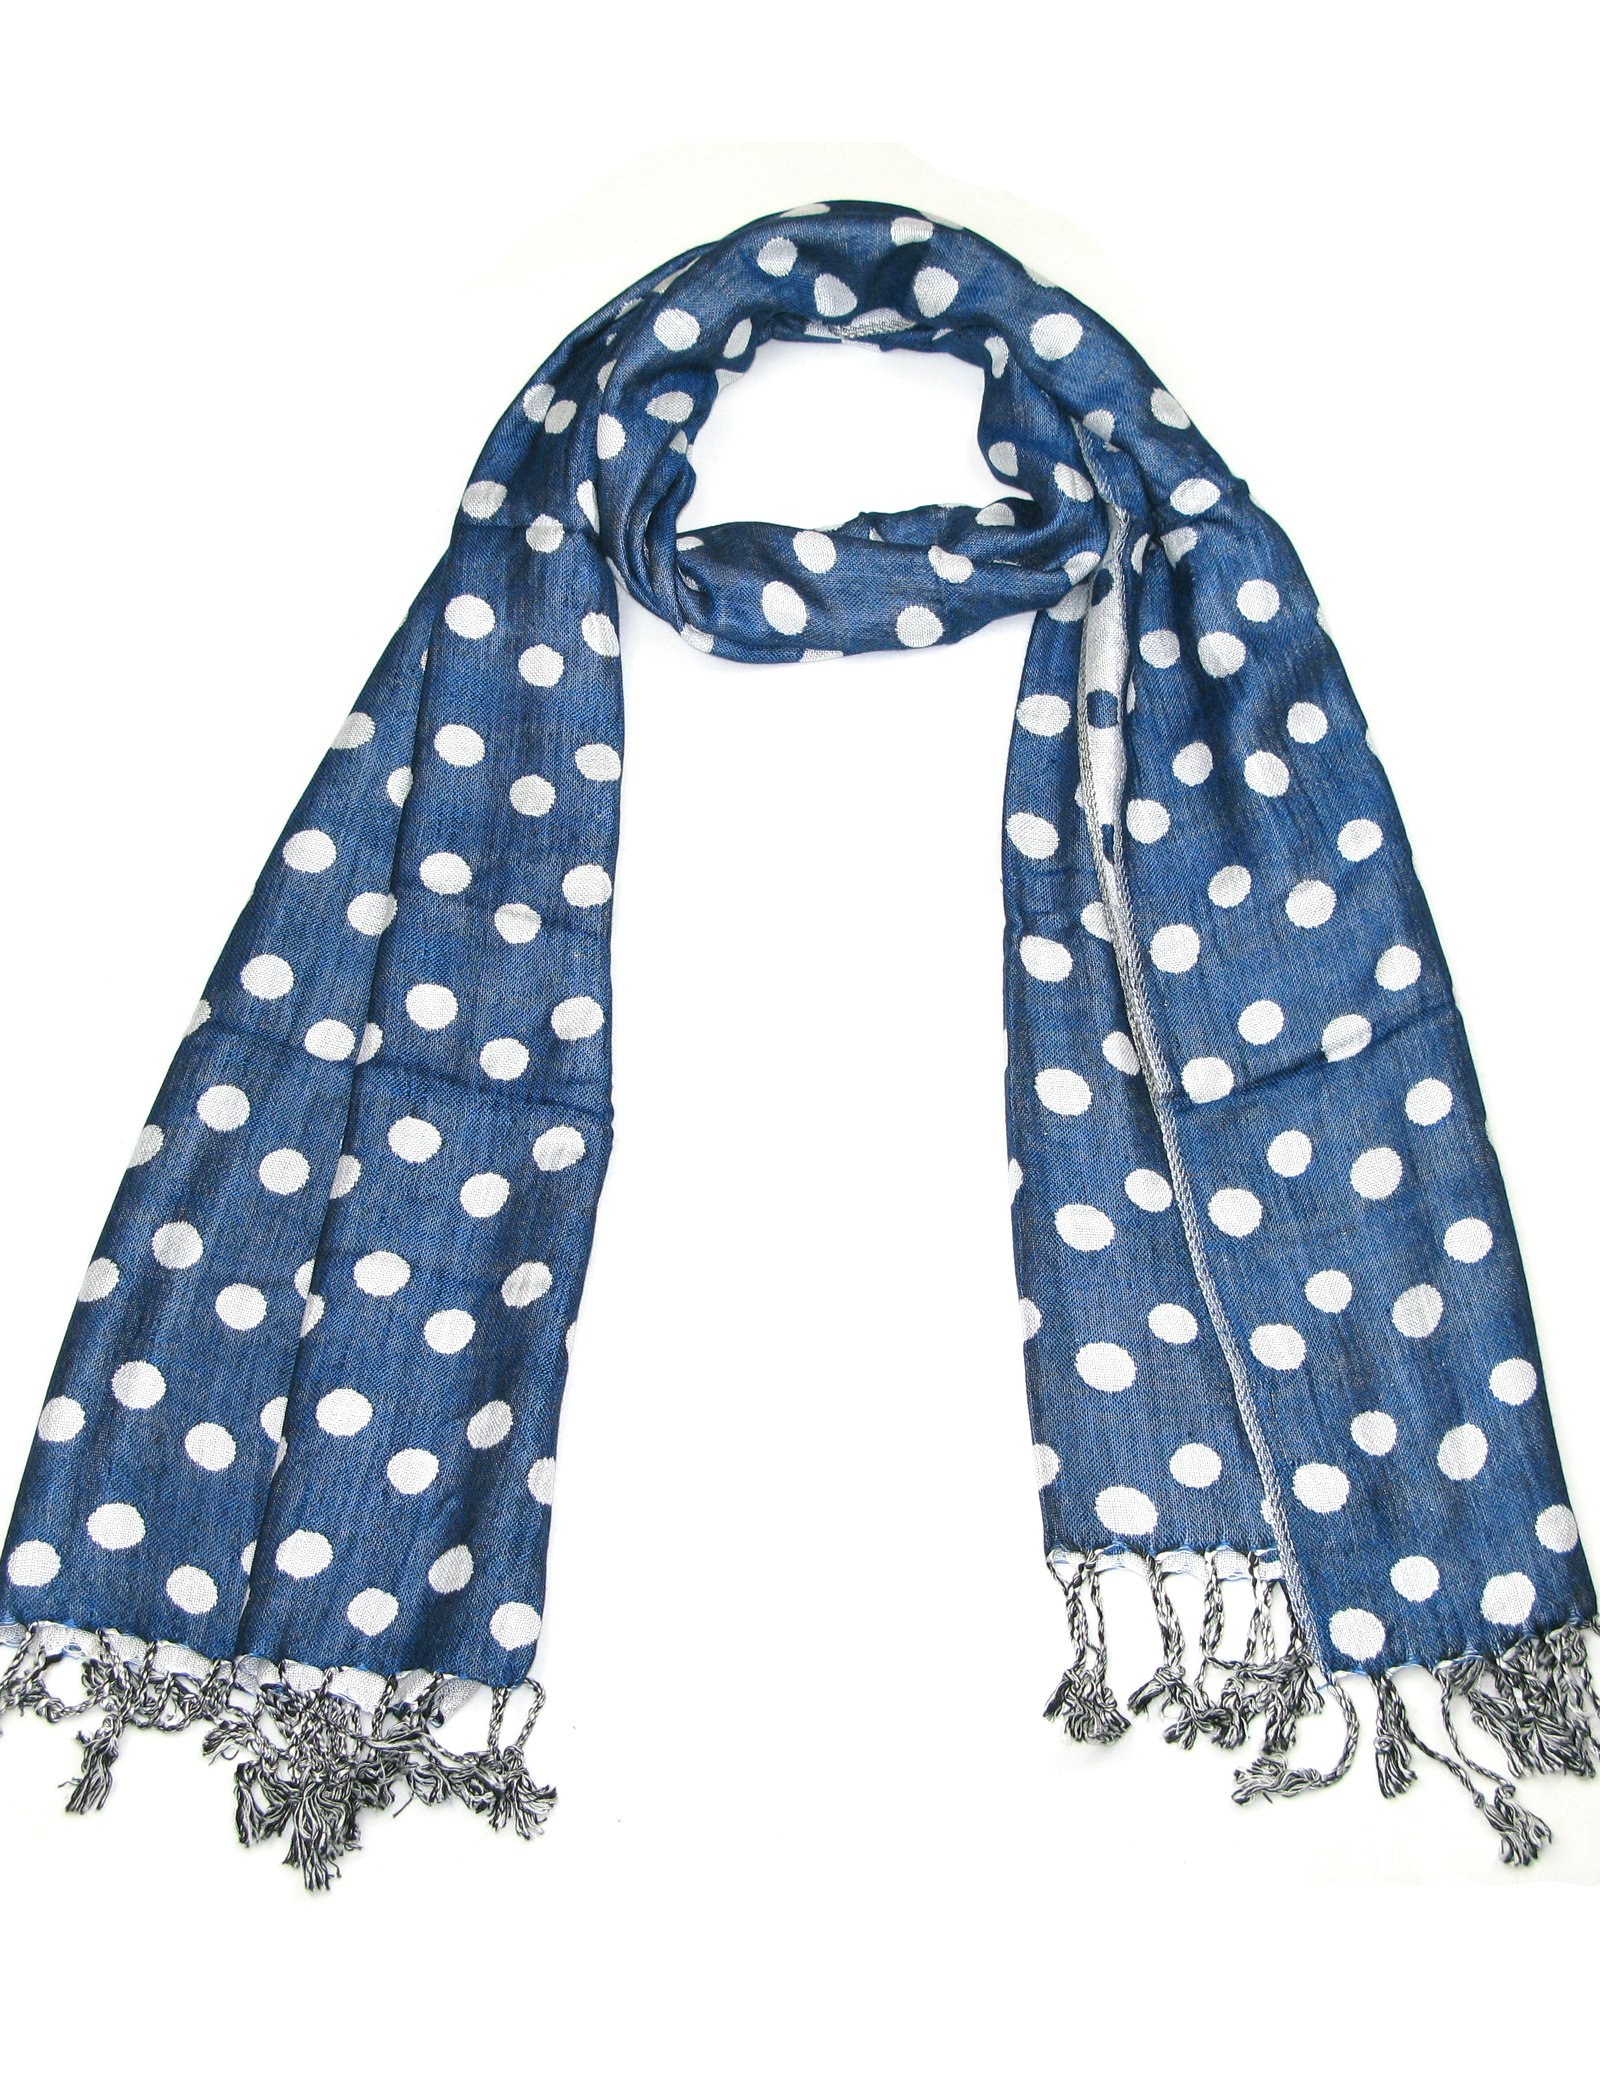 Blue Polka Dot Pashmina Scarf for Women - Fine Quality Dots spots scarves